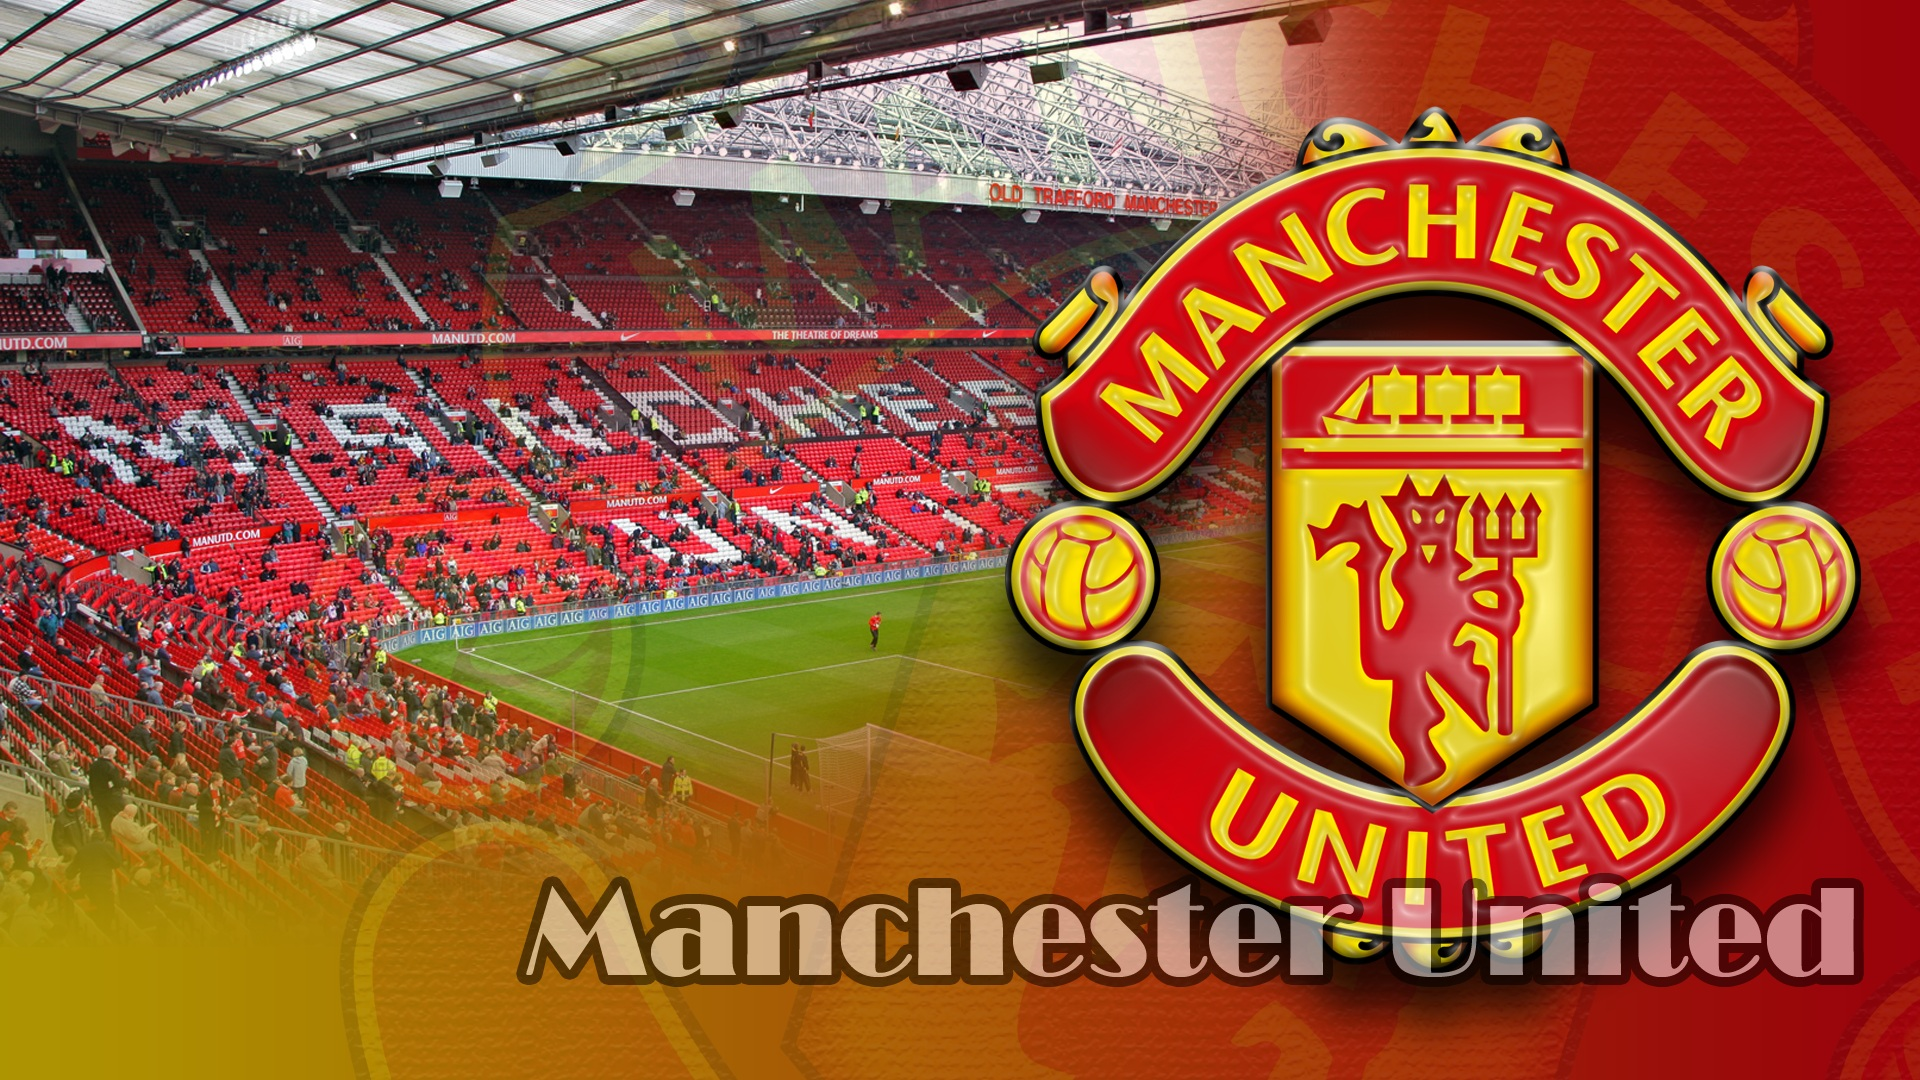 Manchester United Wallpapers Download Desktop Wallpaper Images 1920x1080